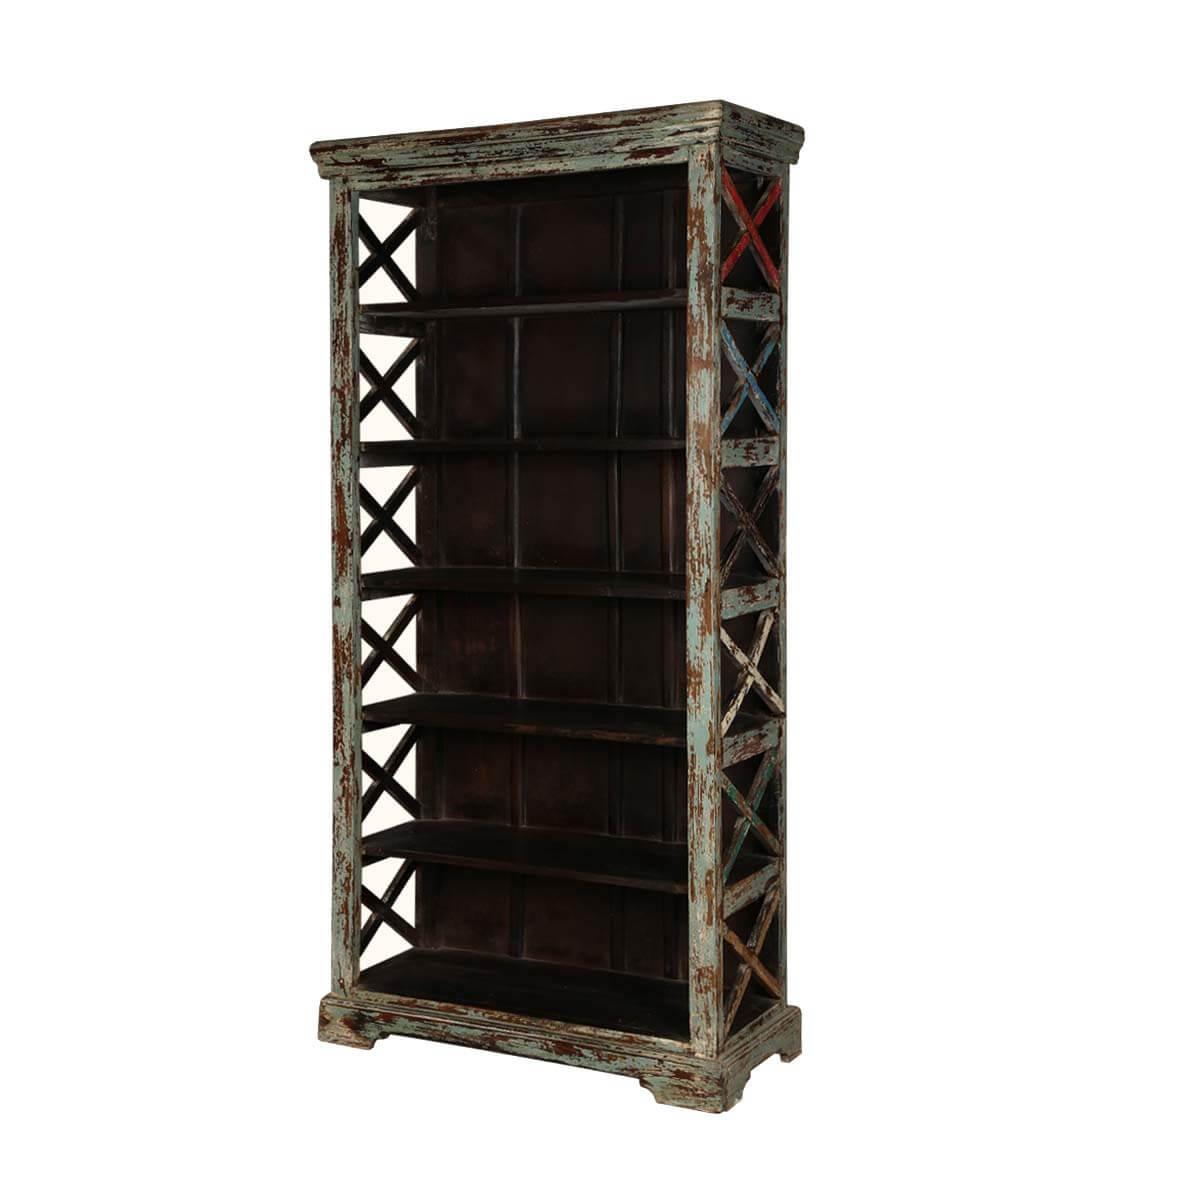 Crisscross 6 Open Shelf Distressed Wood Rustic Bookcase